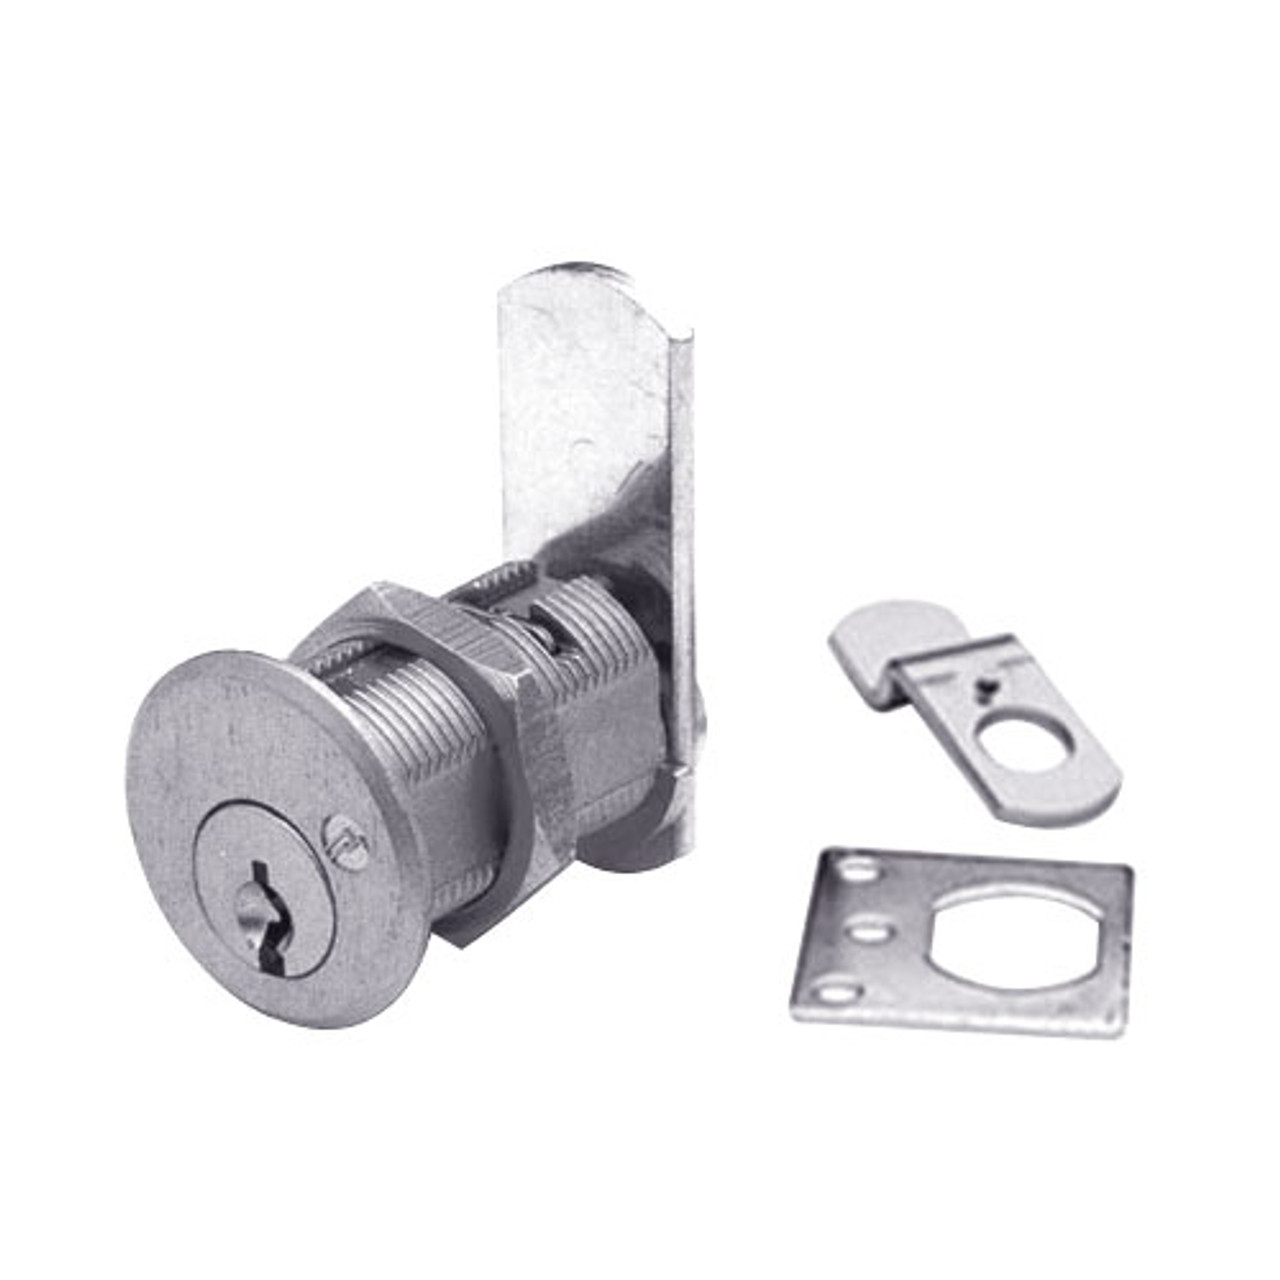 Olympus DCN1-KD-26D Cam Locks in Satin Chrome Finish